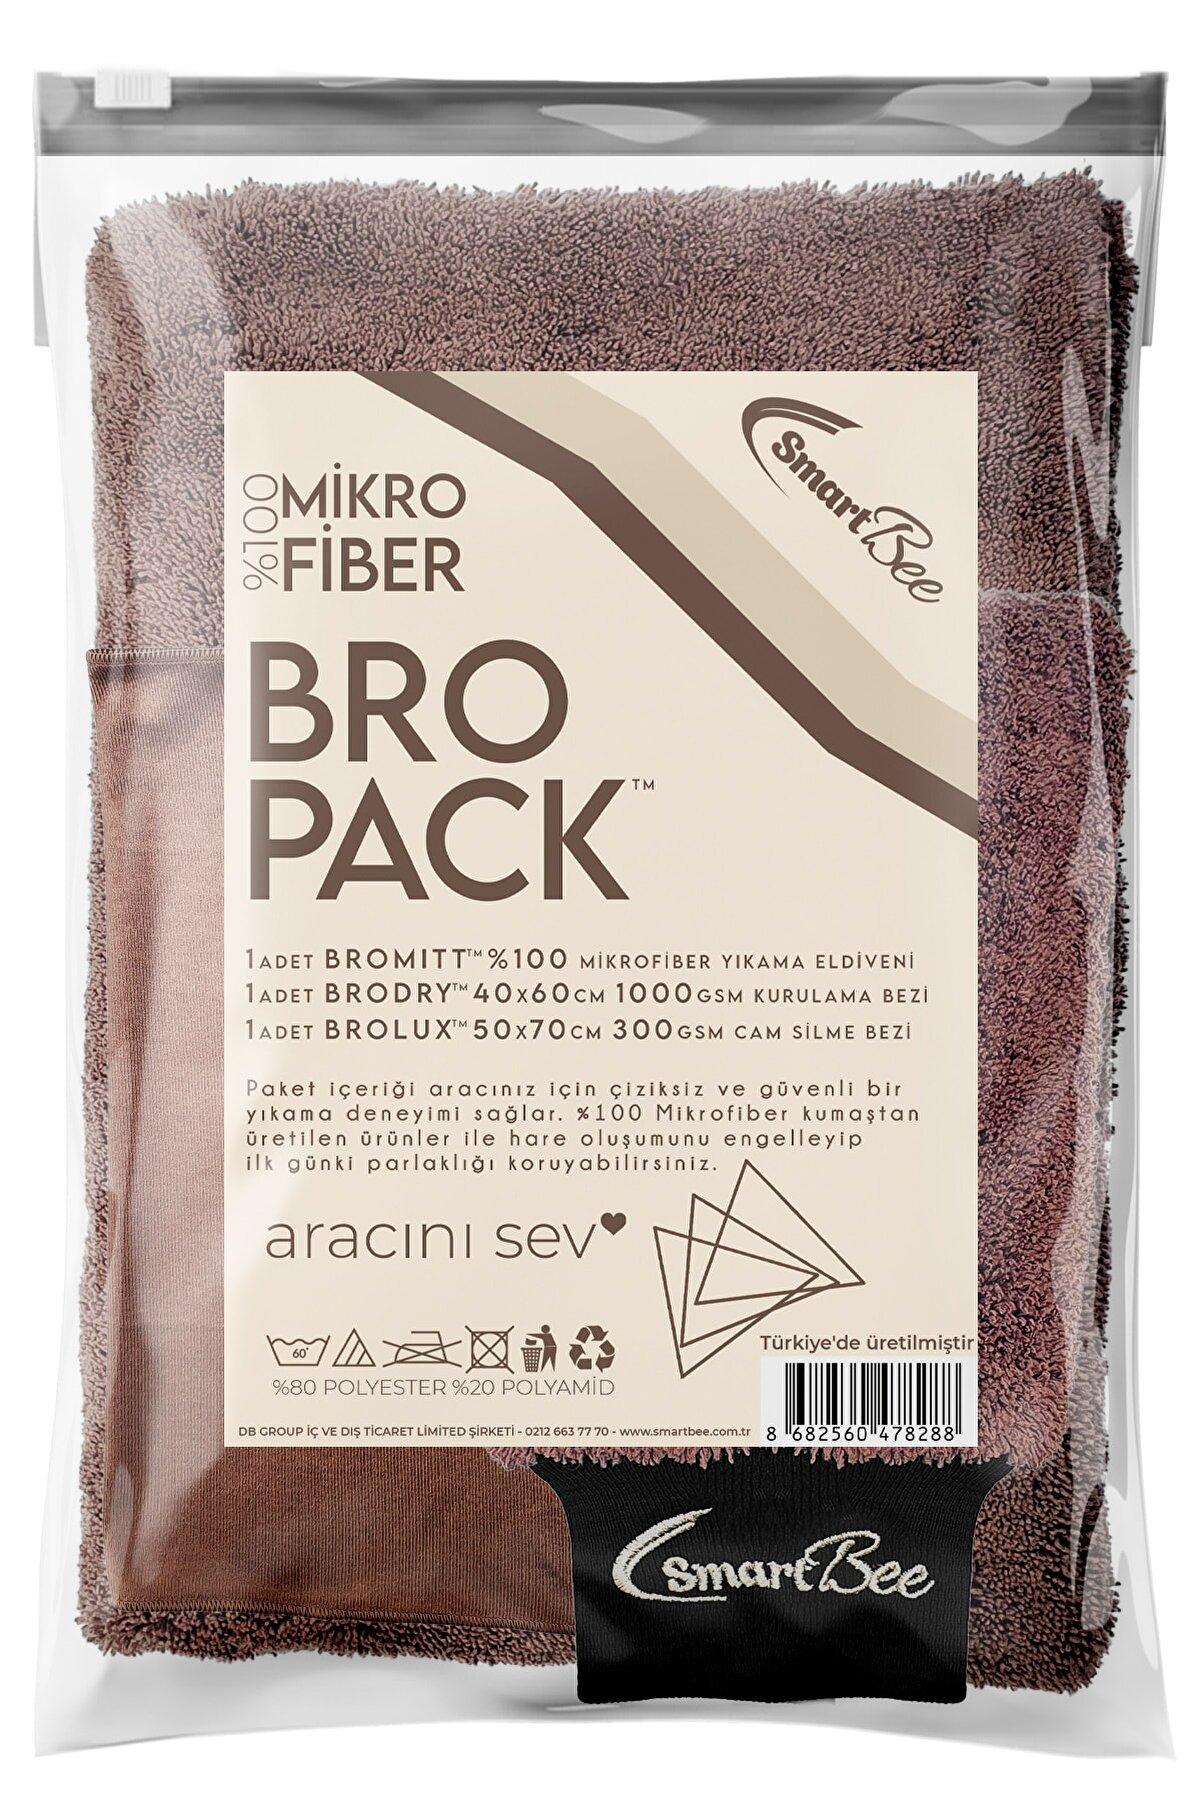 SmartBee Kahverengi Bropack Edgeless Mikrofiber Oto Yıkama Paketi